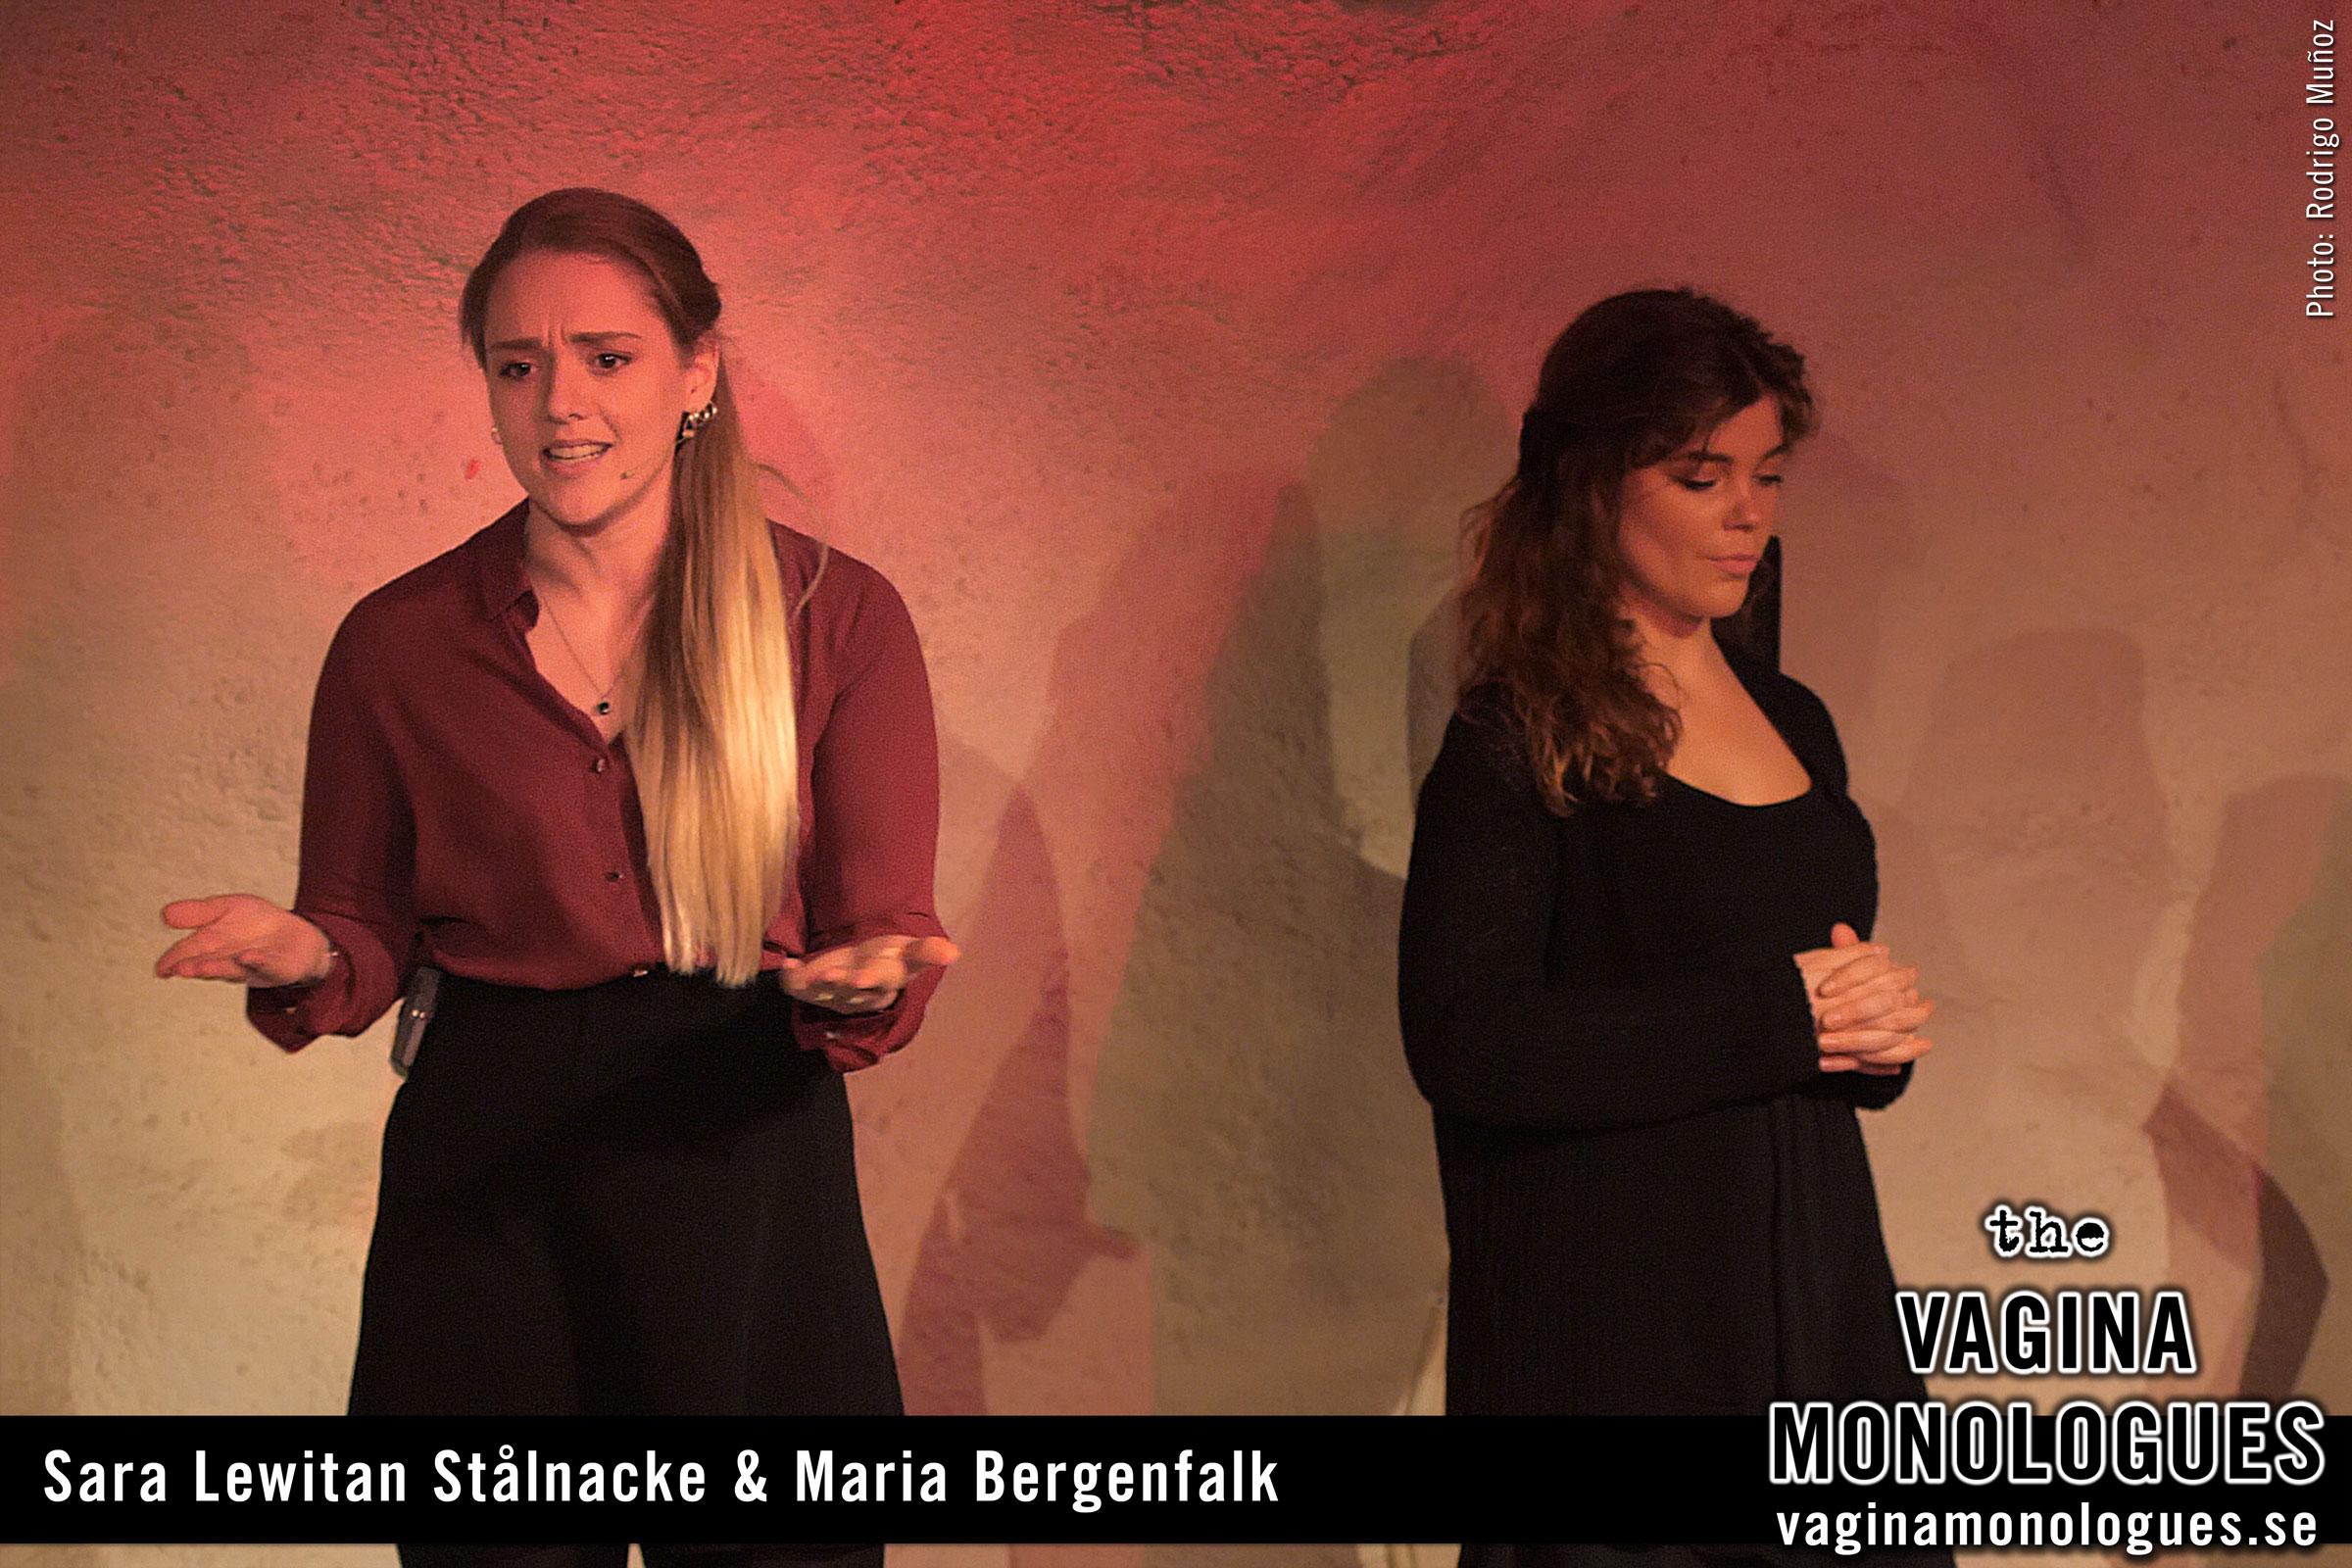 Sara Lewitan Stålnacke & Maria Bergenfalk